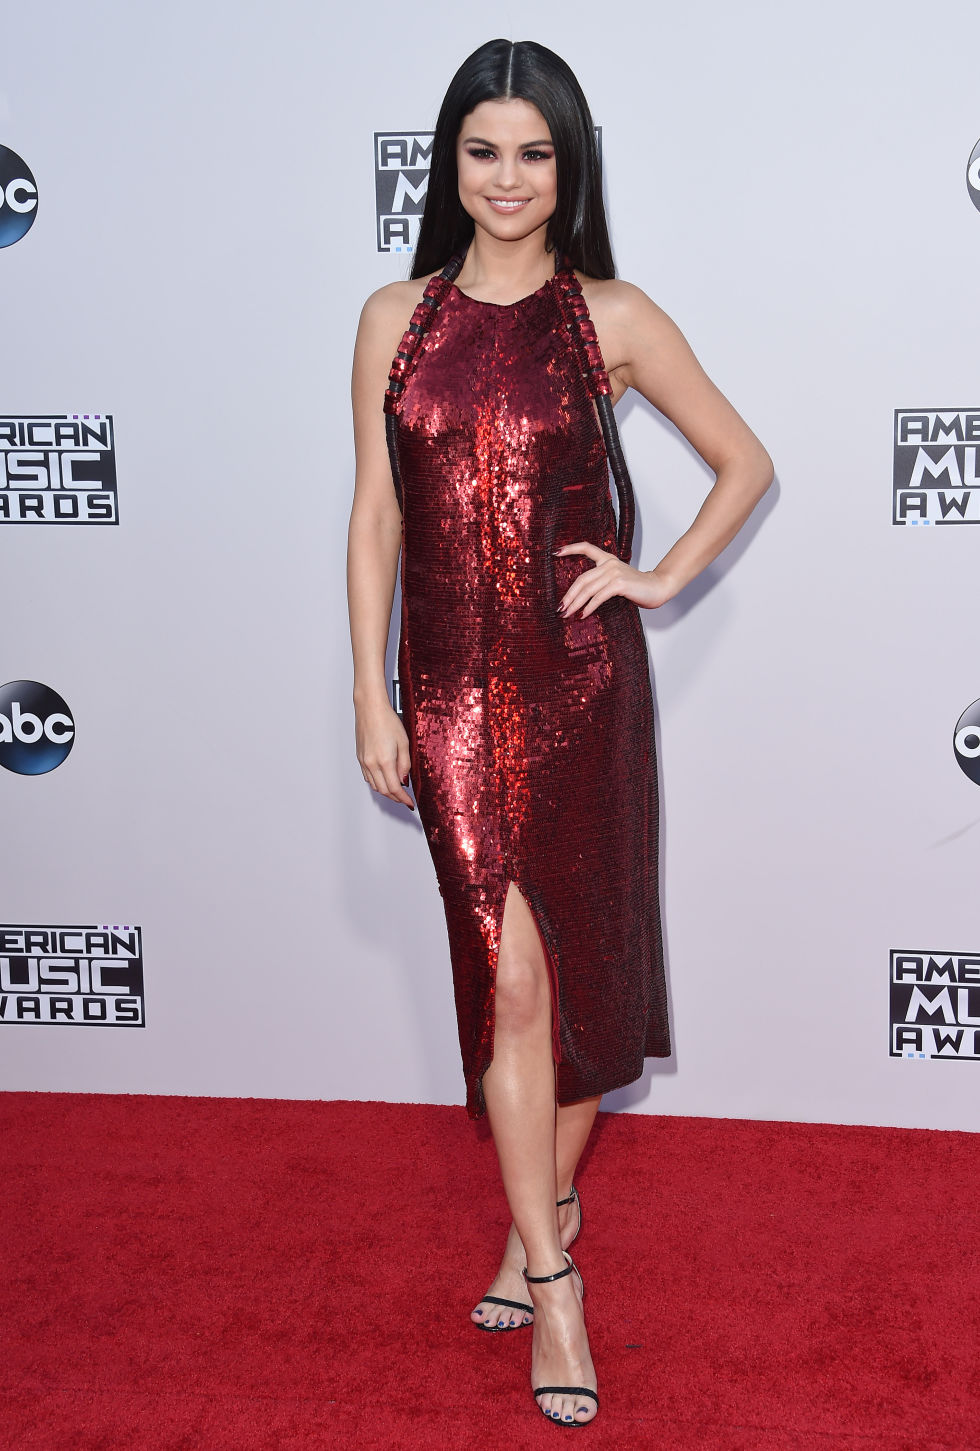 63 Selena Gomez Cutest Outfits - Selena Gomez Street Style